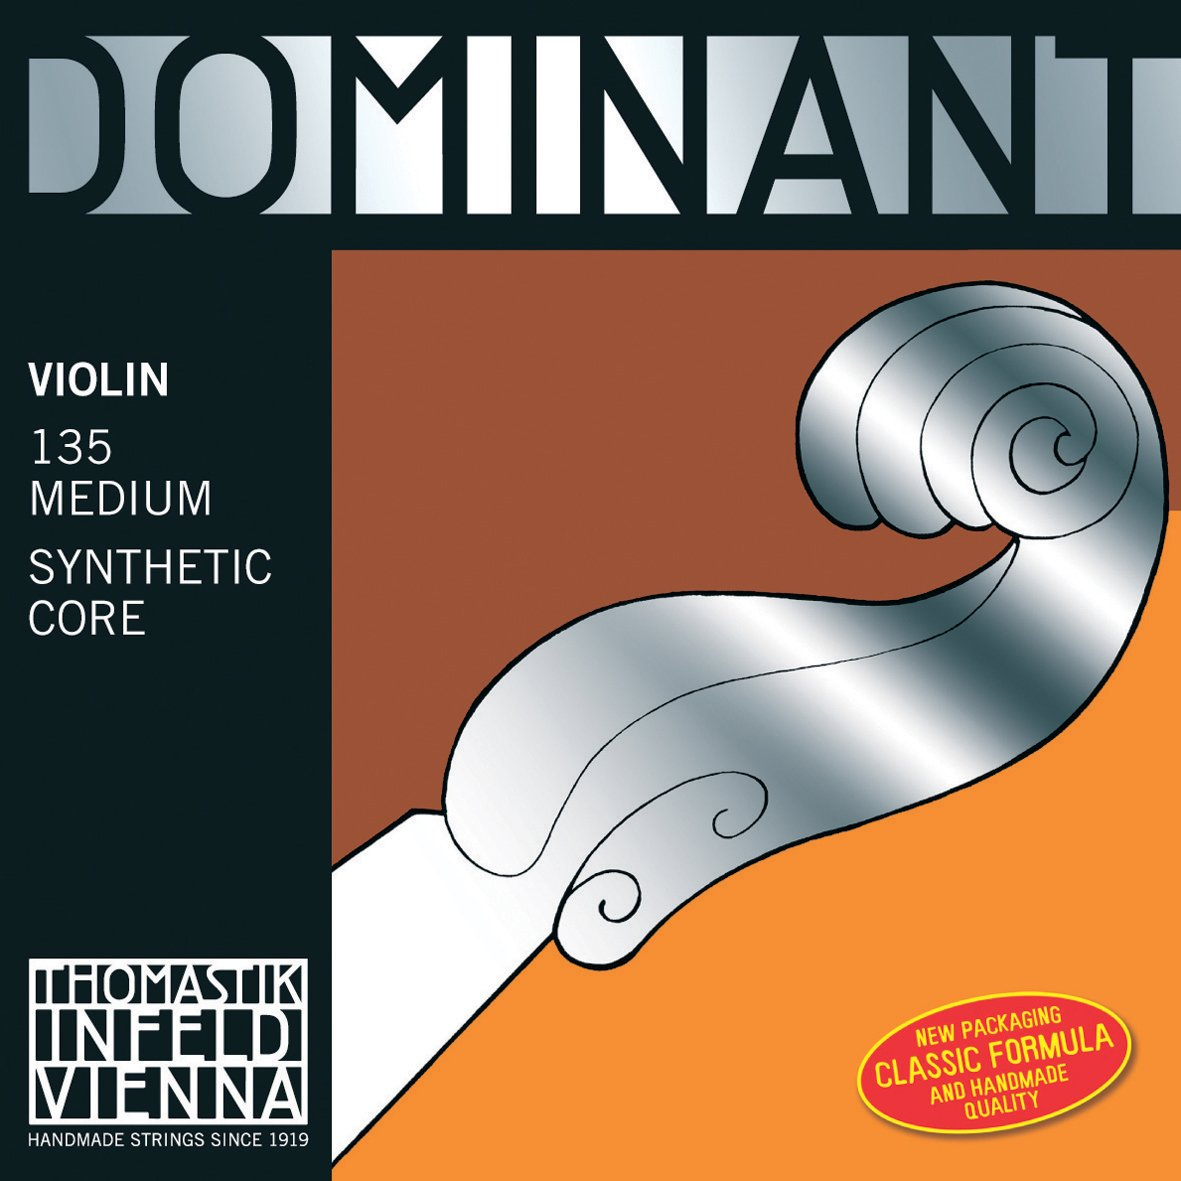 Thomastik-Infeld 135B.34 Dominant Violin Strings Set 3/4 Size Connolly Music Company